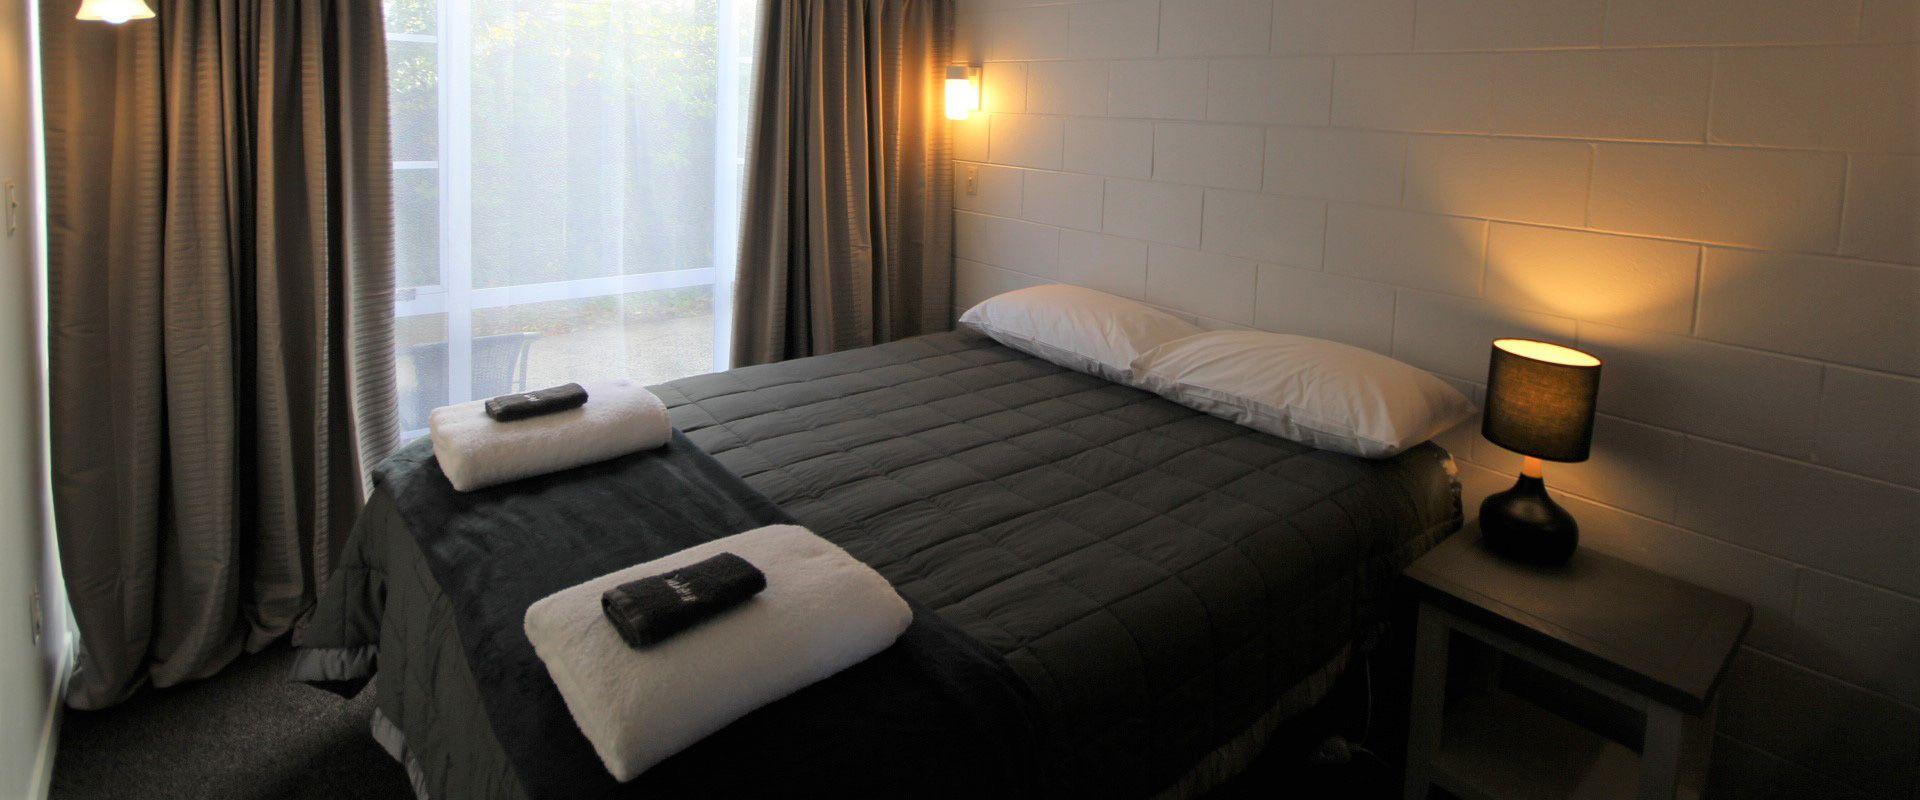 large 2-bedroom unit bedroom